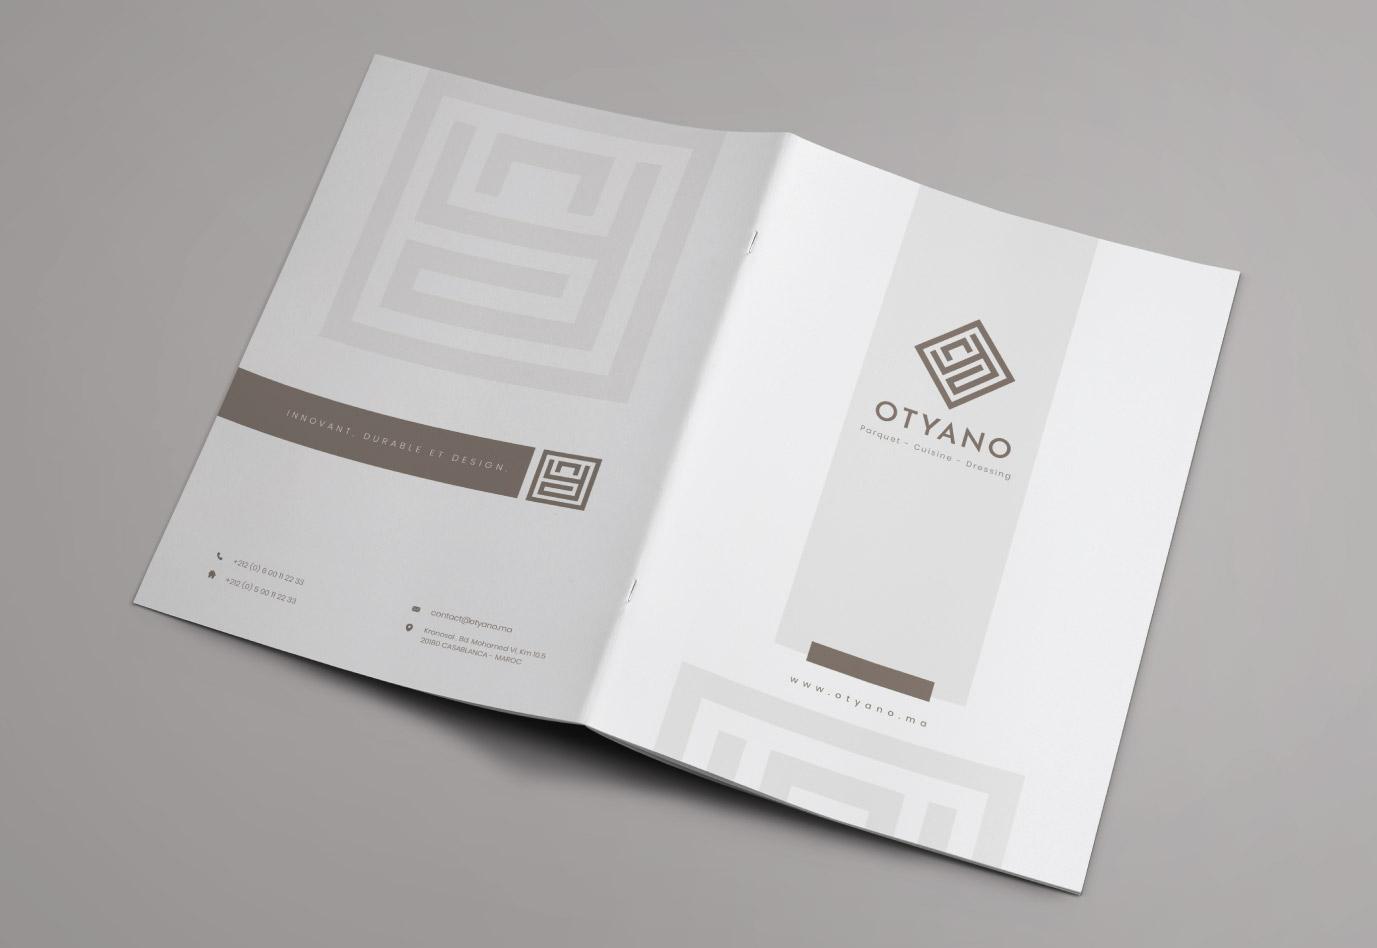 chemise-a-rabat-Otyano-agence de communication -vuenova